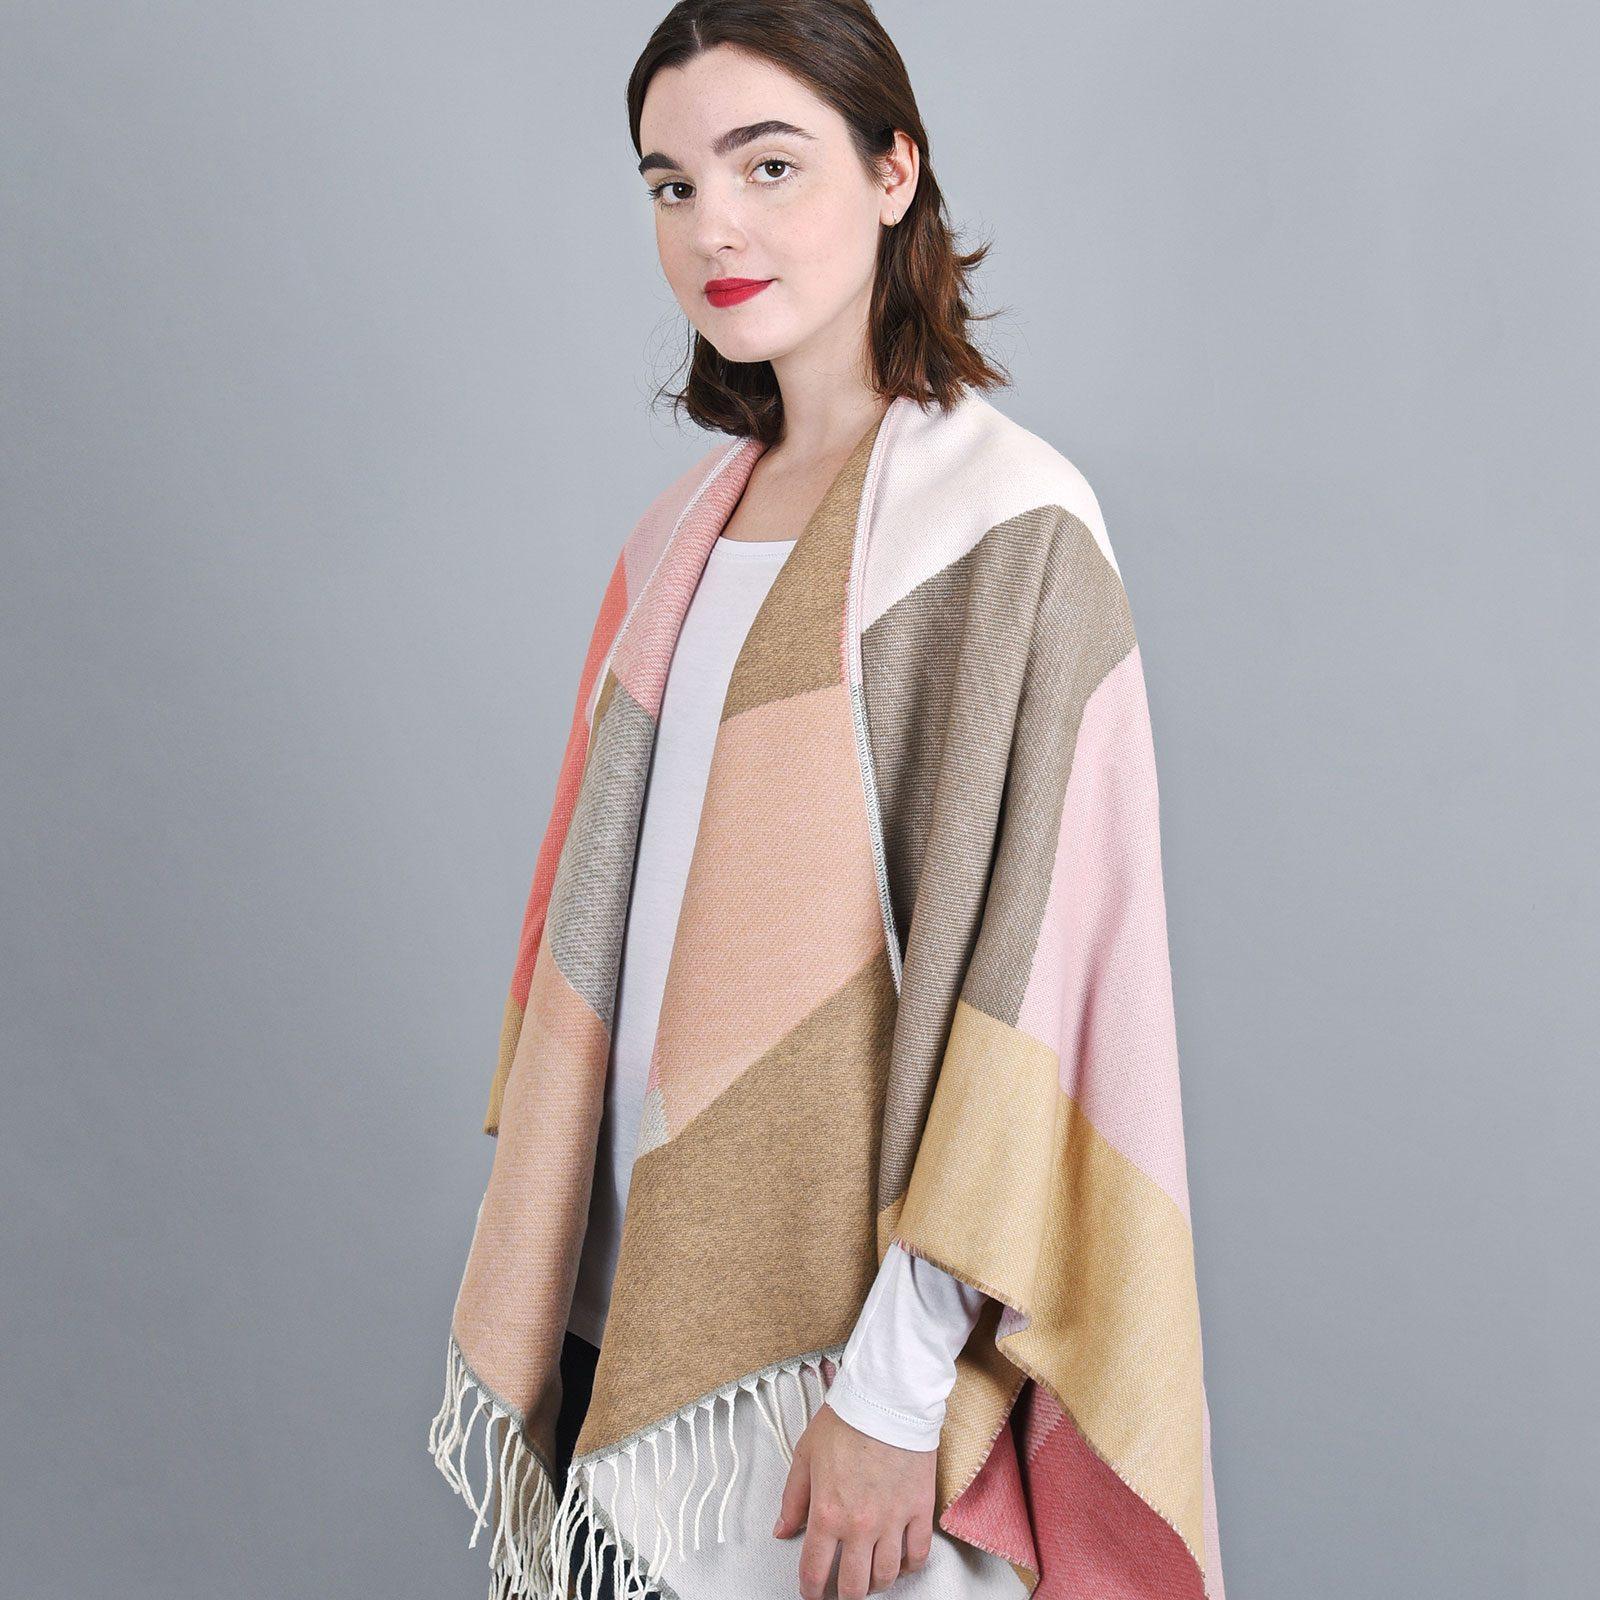 http://lookbook.allee-du-foulard.fr/wp-content/uploads/2019/01/AT-04152-VF16-2-poncho-hiver-rose-taupe-1600x1600.jpg